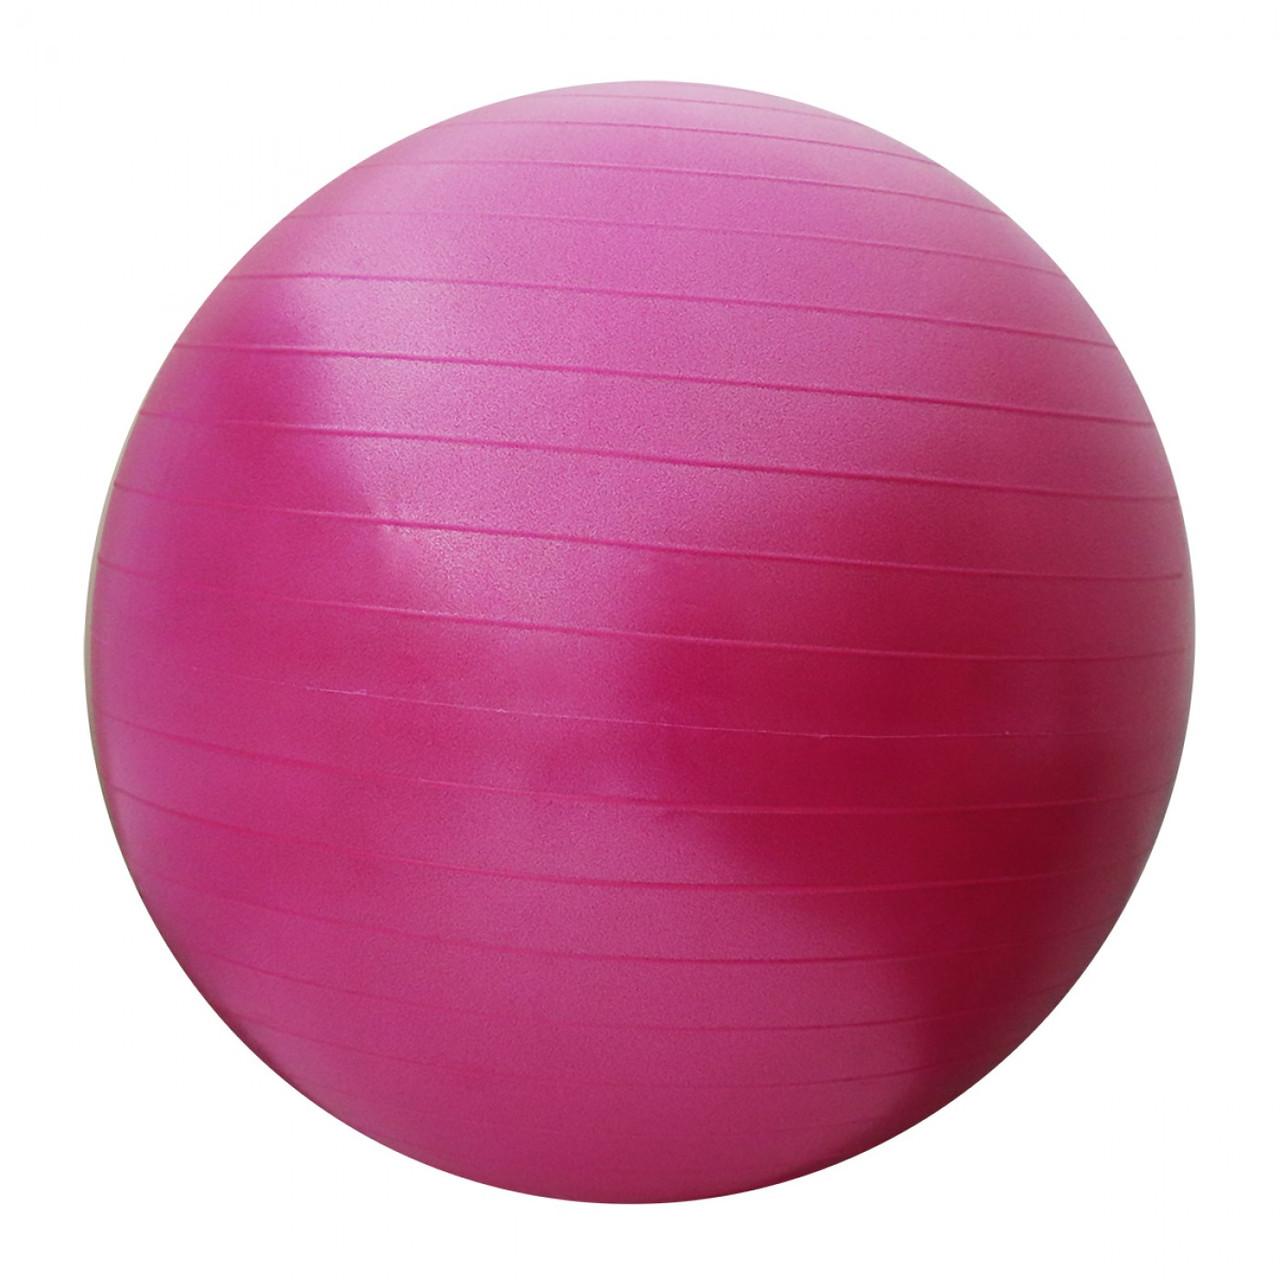 М'яч для фітнесу (фітбол) SportVida 55 см Anti-Burst SV-HK0287 Pink